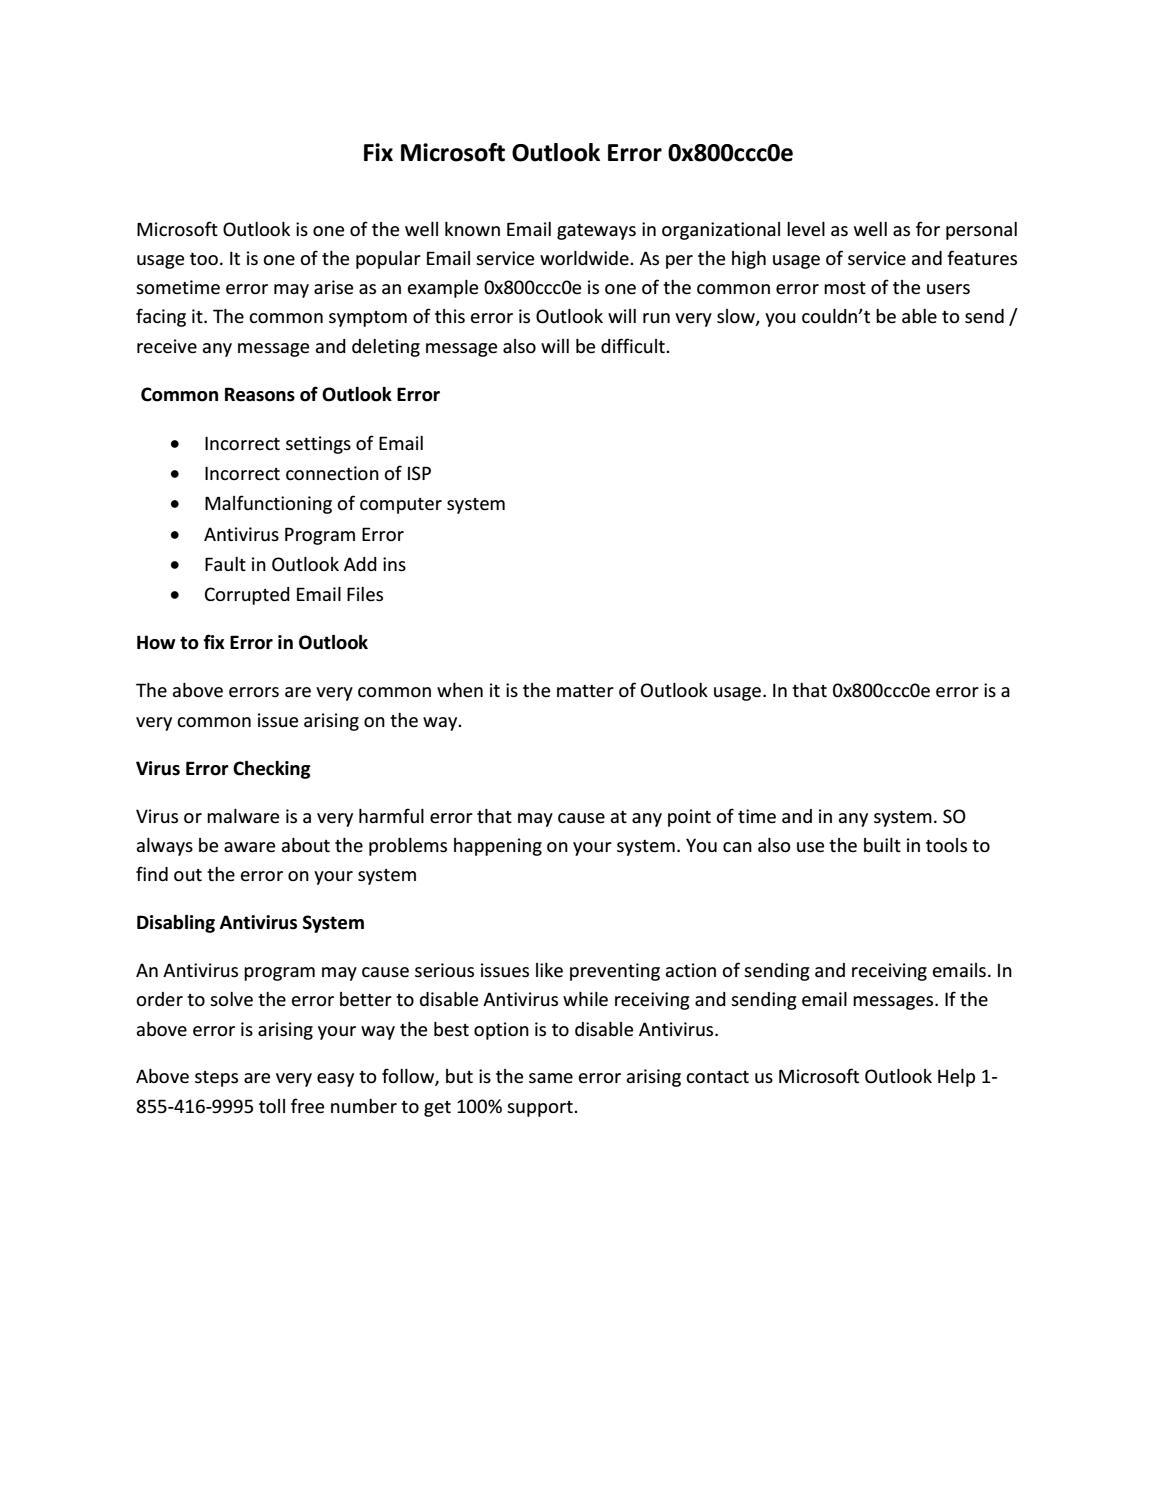 Fix Microsoft Outlook Error 0x800ccc0e by Robert Smith - Issuu